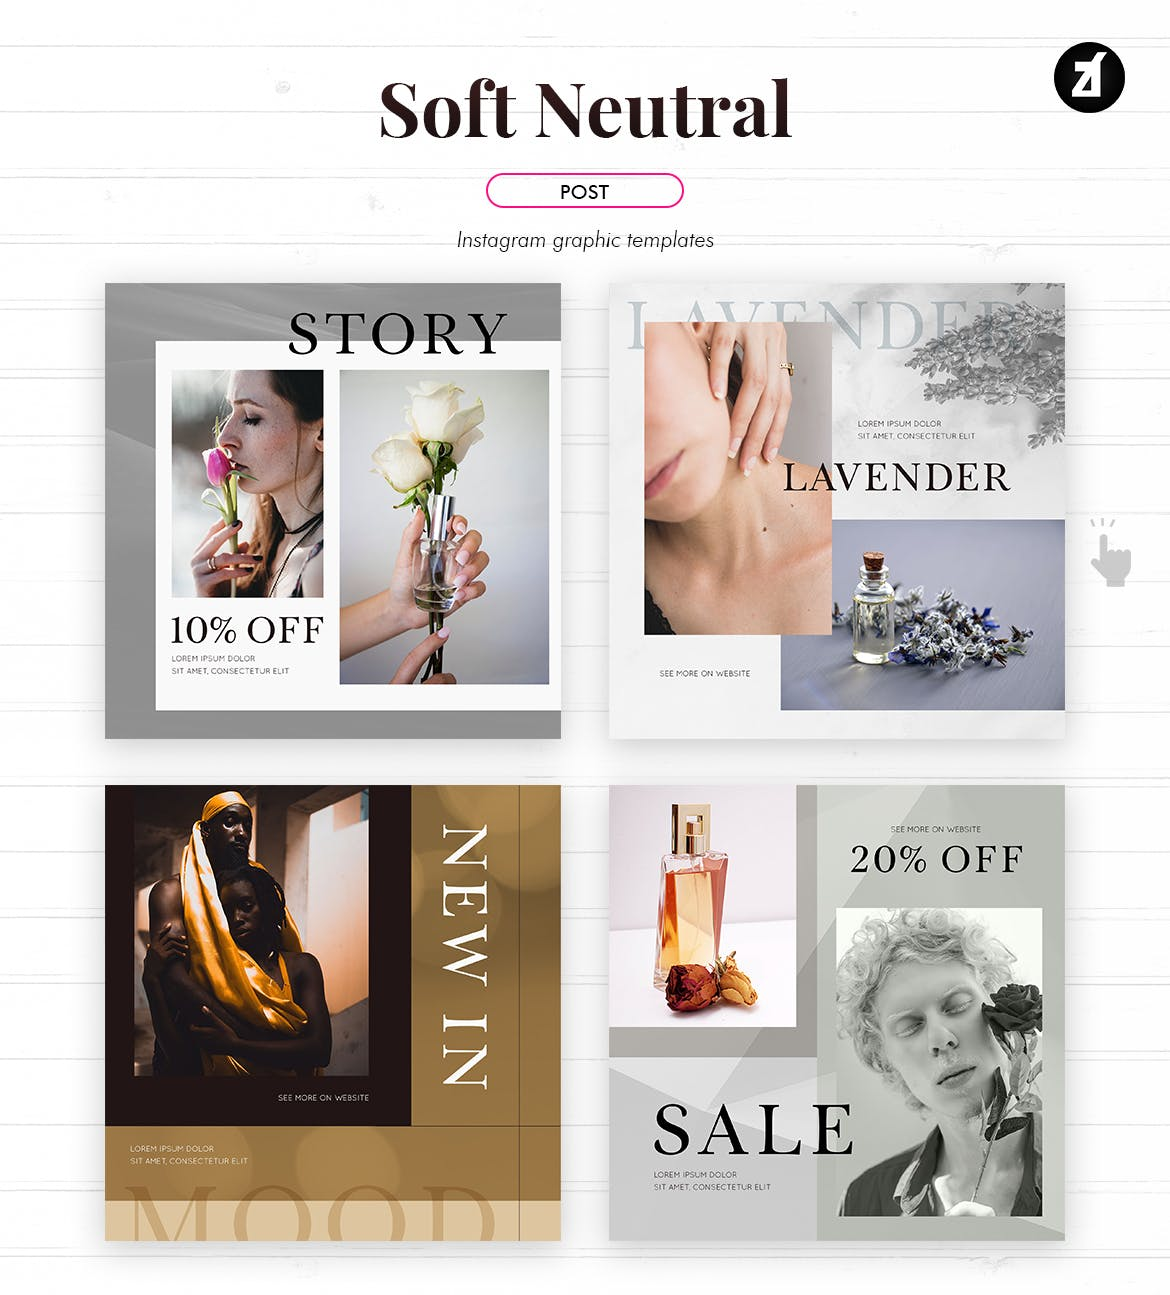 时尚化妆护肤品品牌推广新媒体电商海报模板 Soft Neutral Social Media Graphic Templates插图3